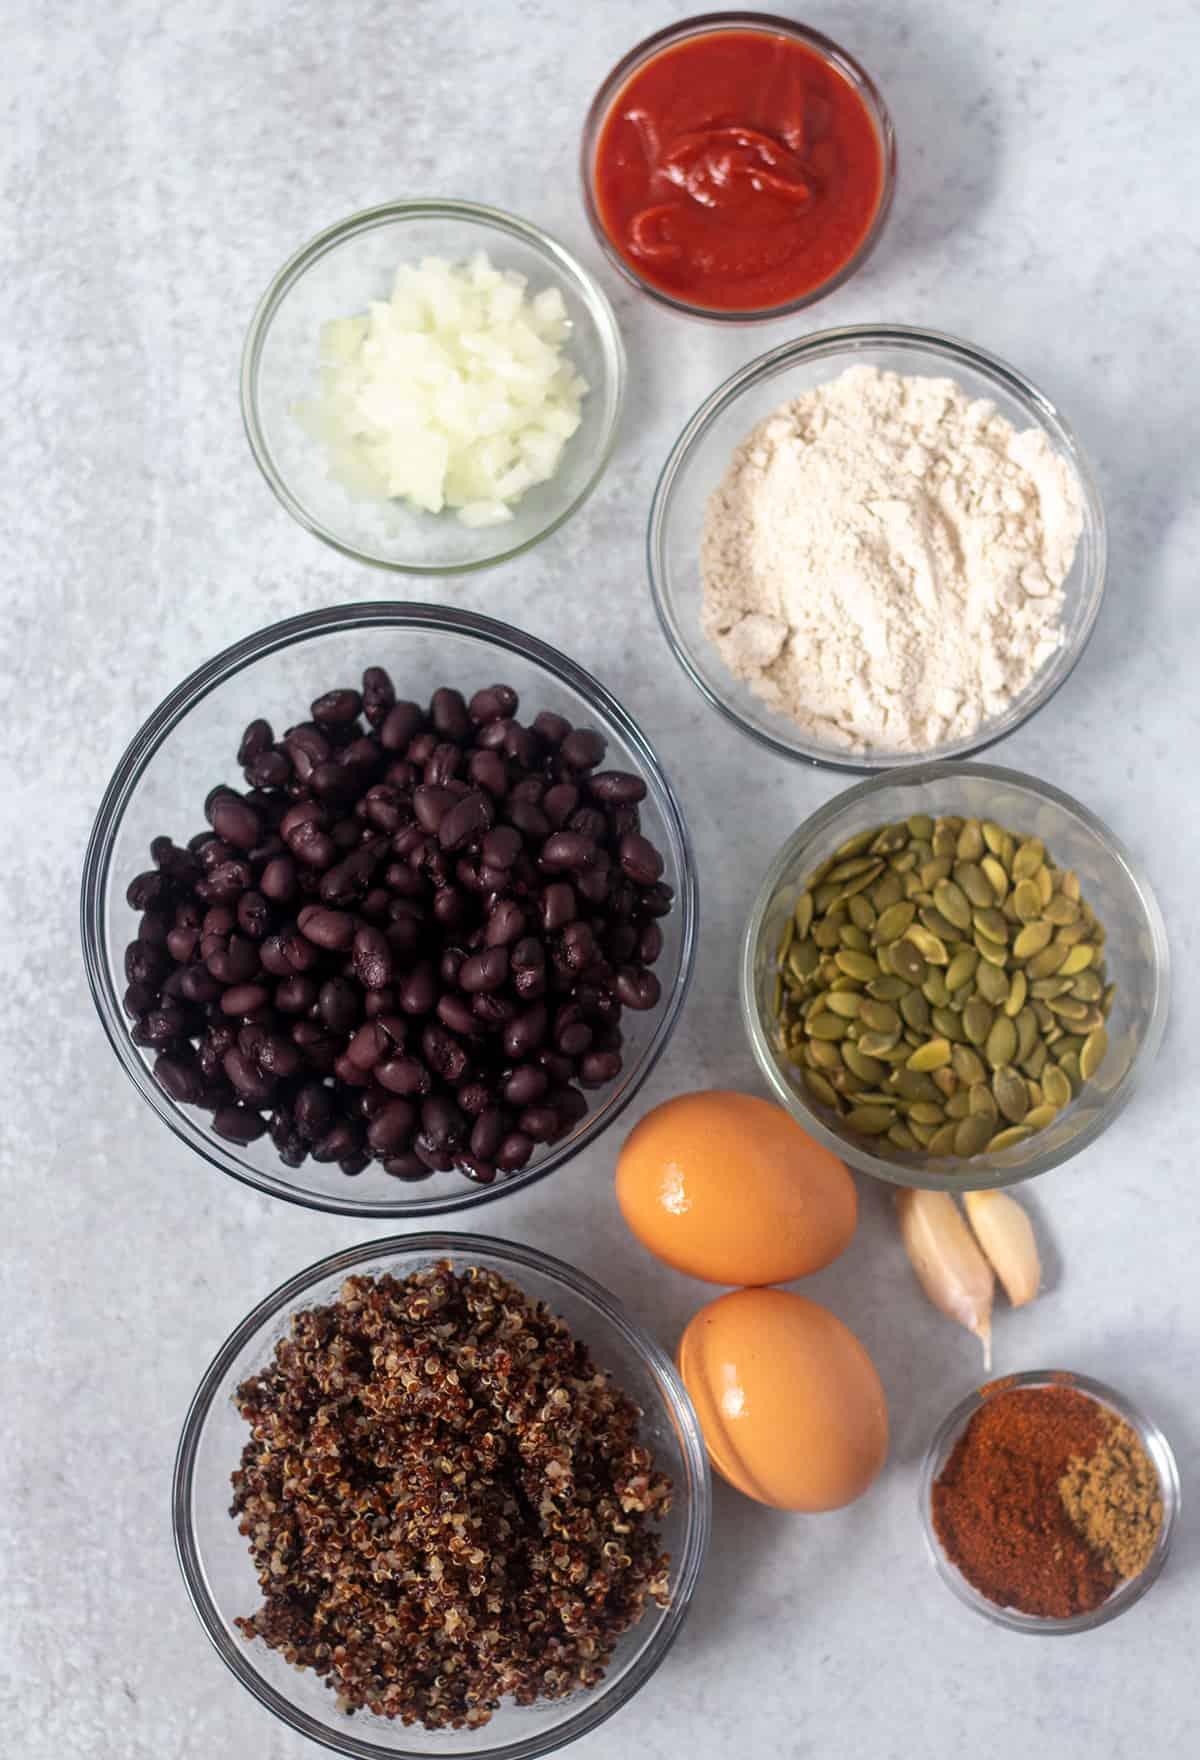 black beans, onion, ketchup, oat flour, quinoa, pumpkin seeds, eggs, garlic cloves and seasonings